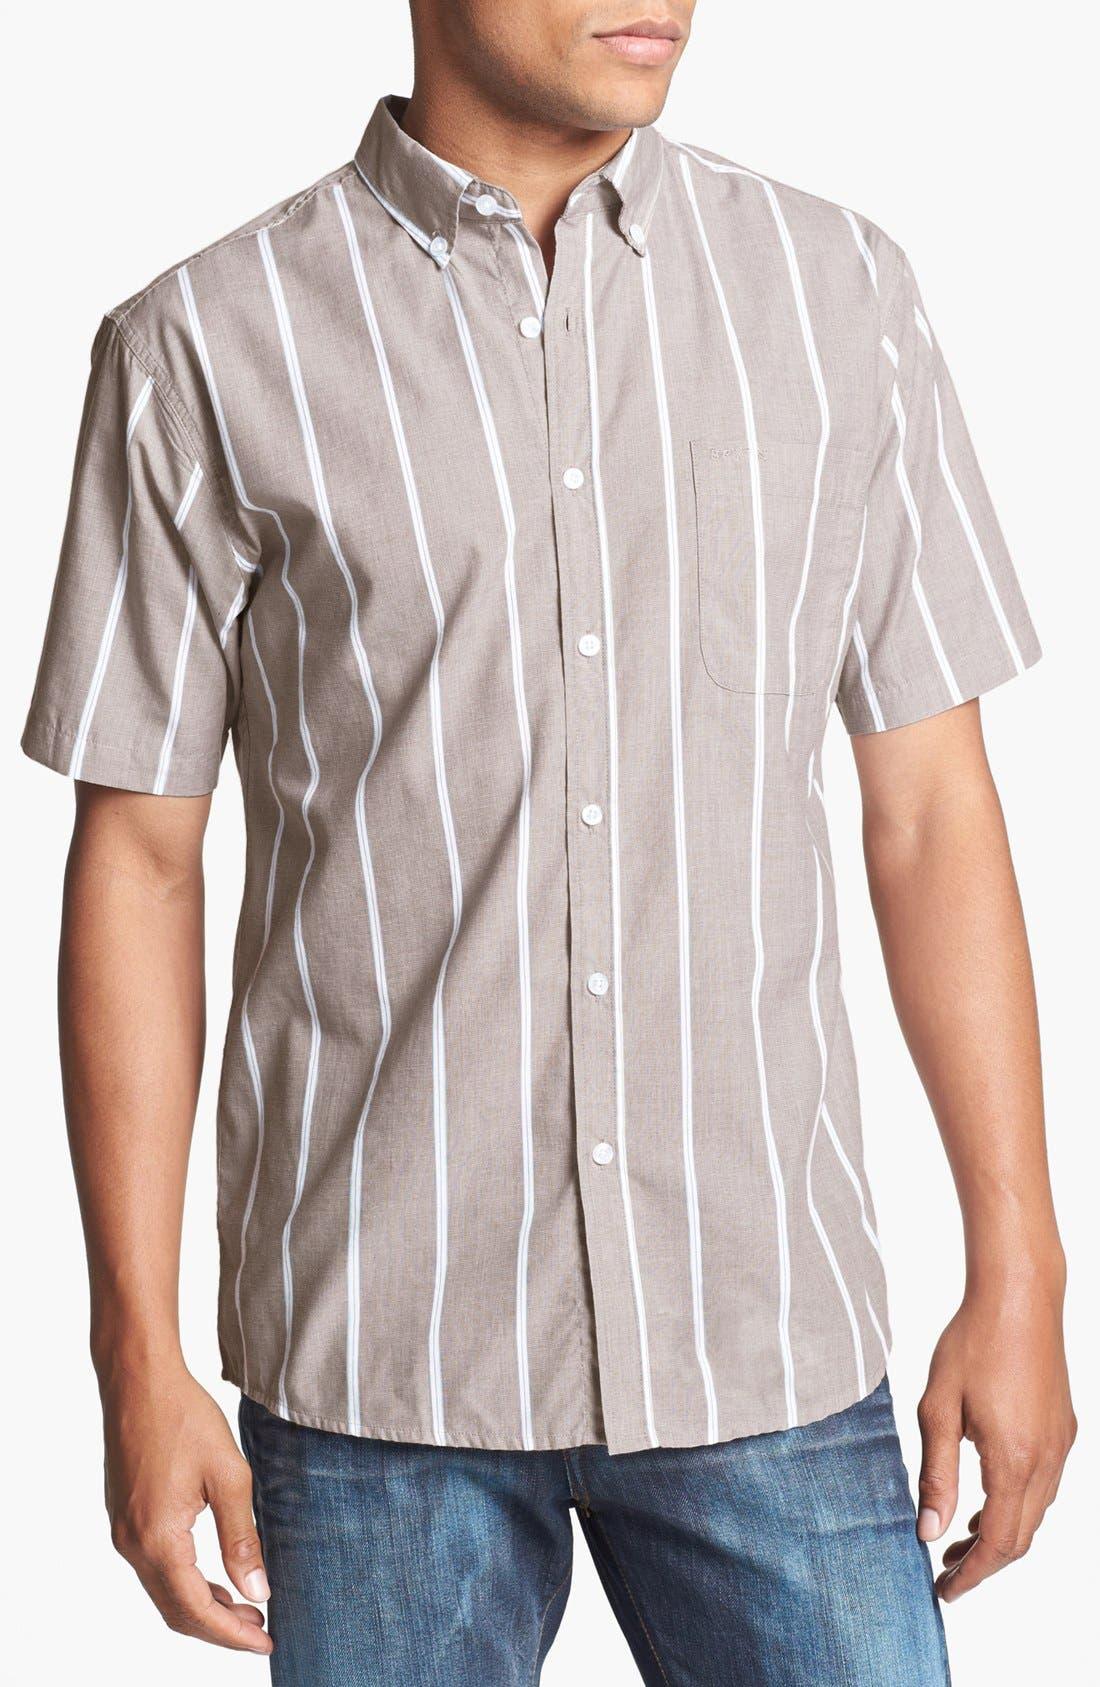 Alternate Image 1 Selected - Brixton 'Baylor' Stripe Oxford Shirt